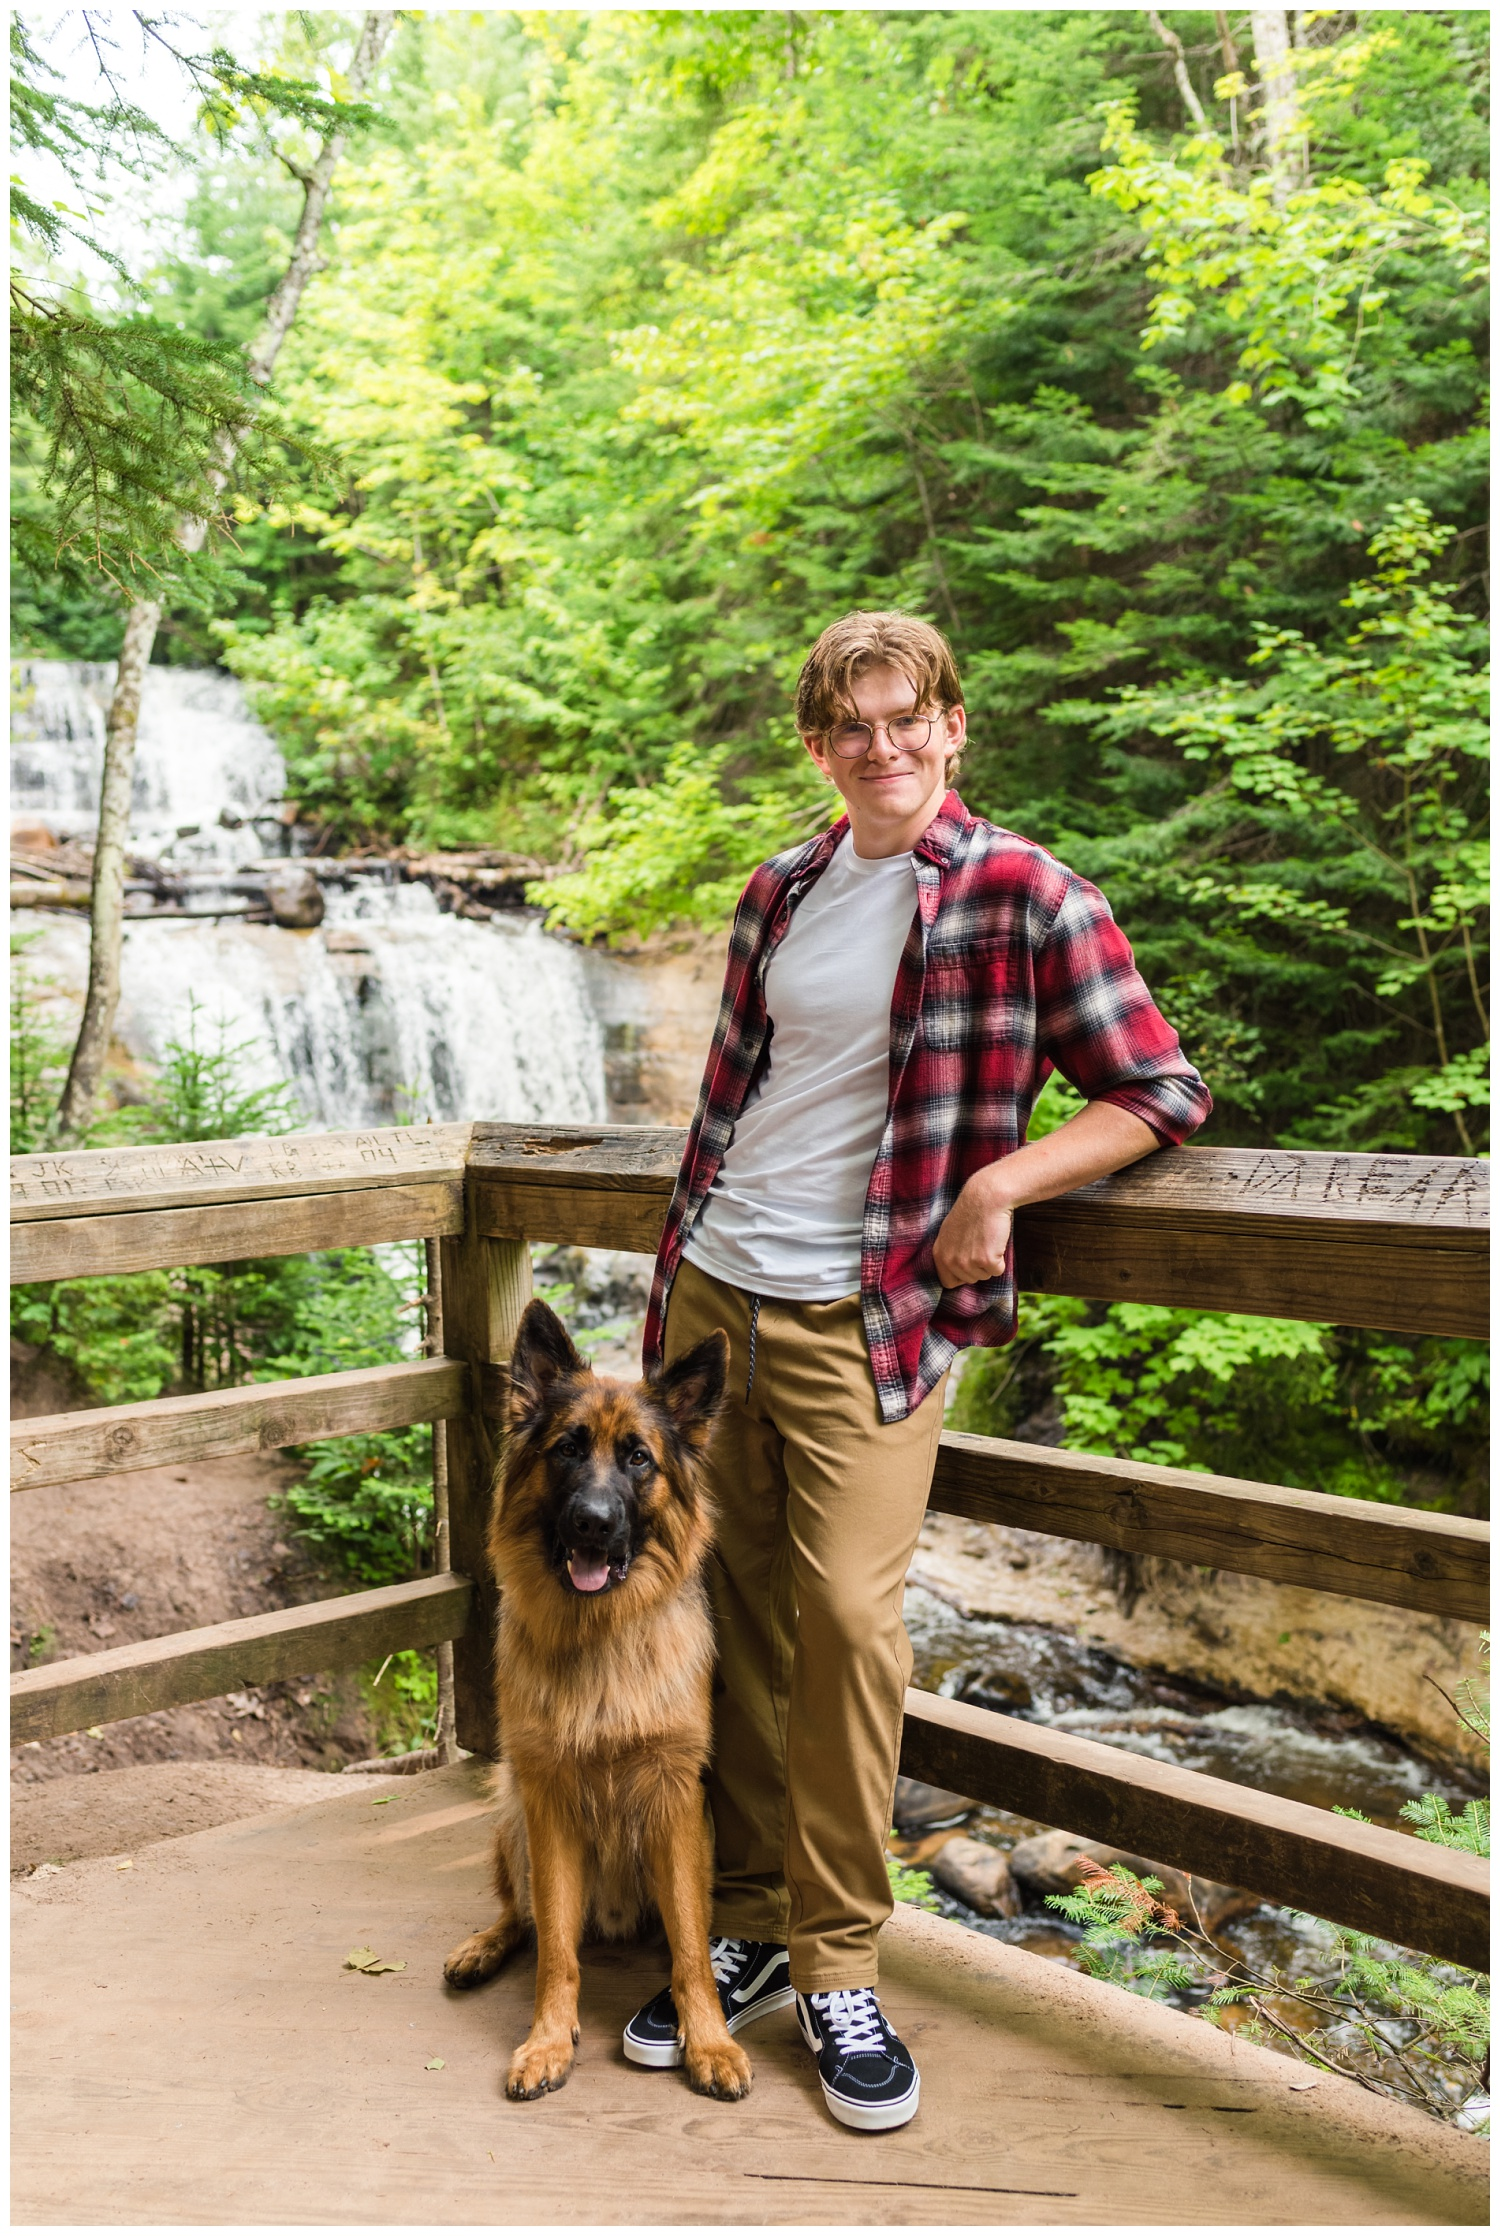 sable falls in grand marais mi with german shepherd